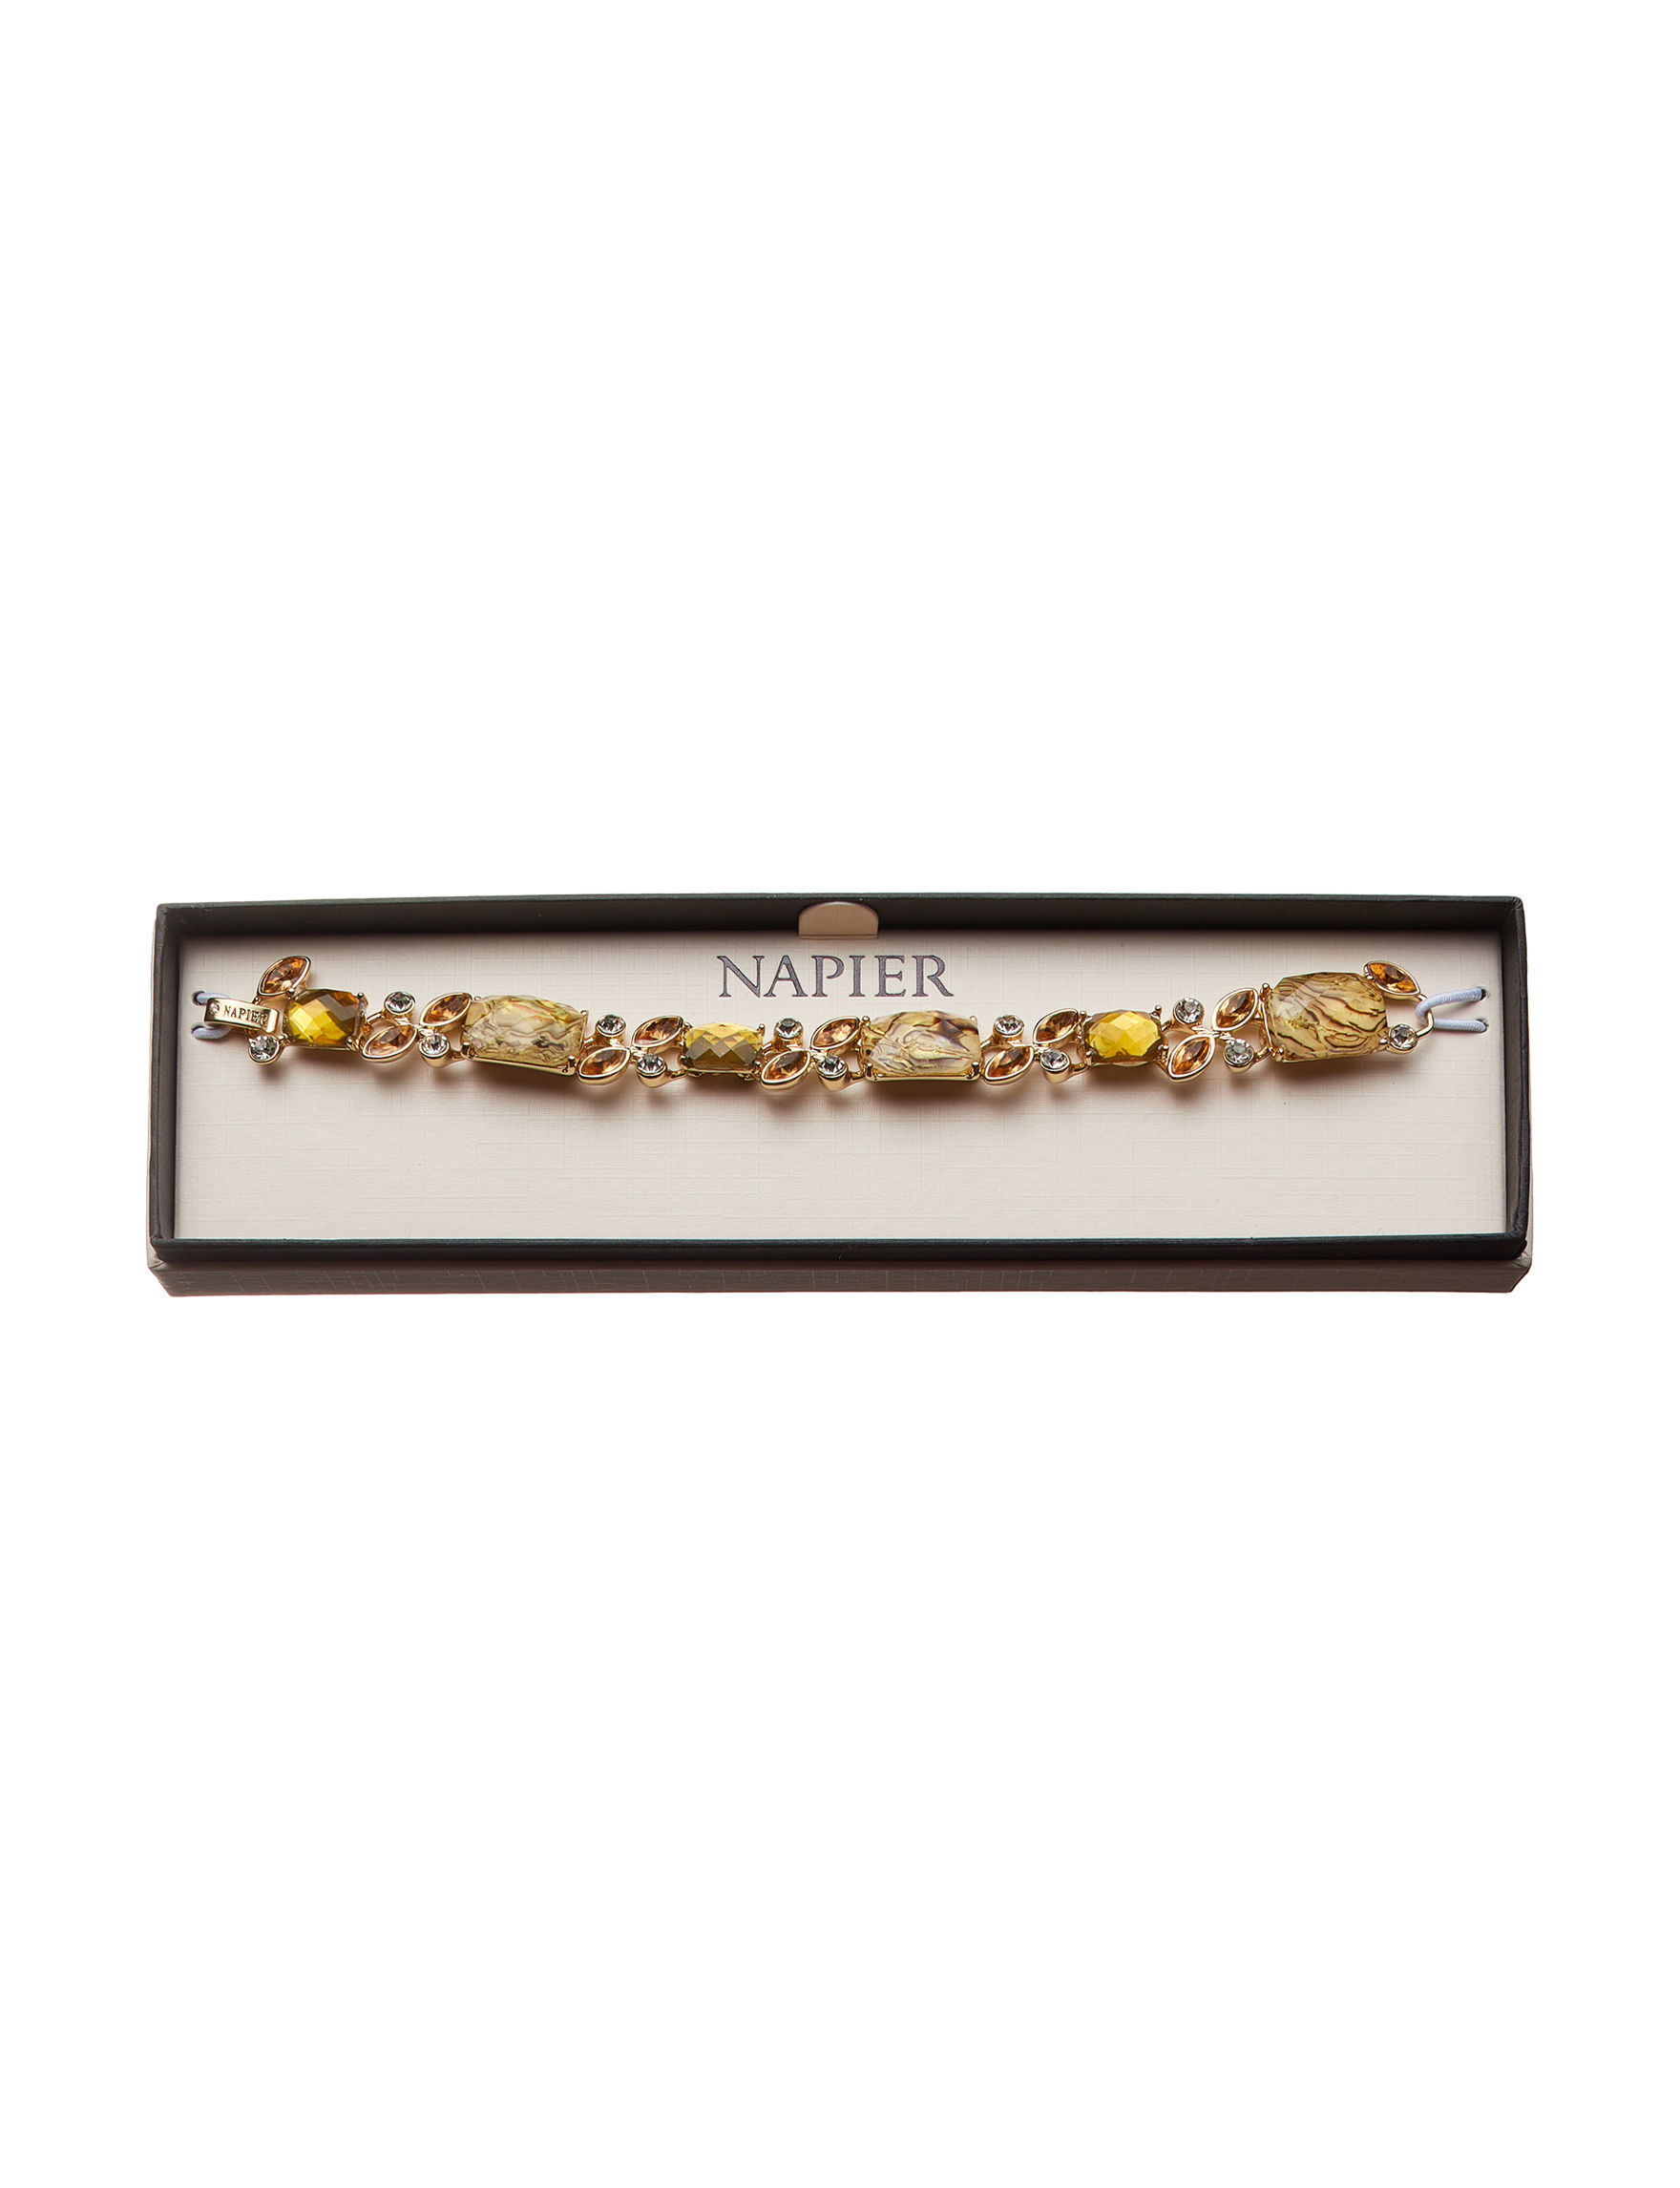 Napier Gold Bracelets Fashion Jewelry